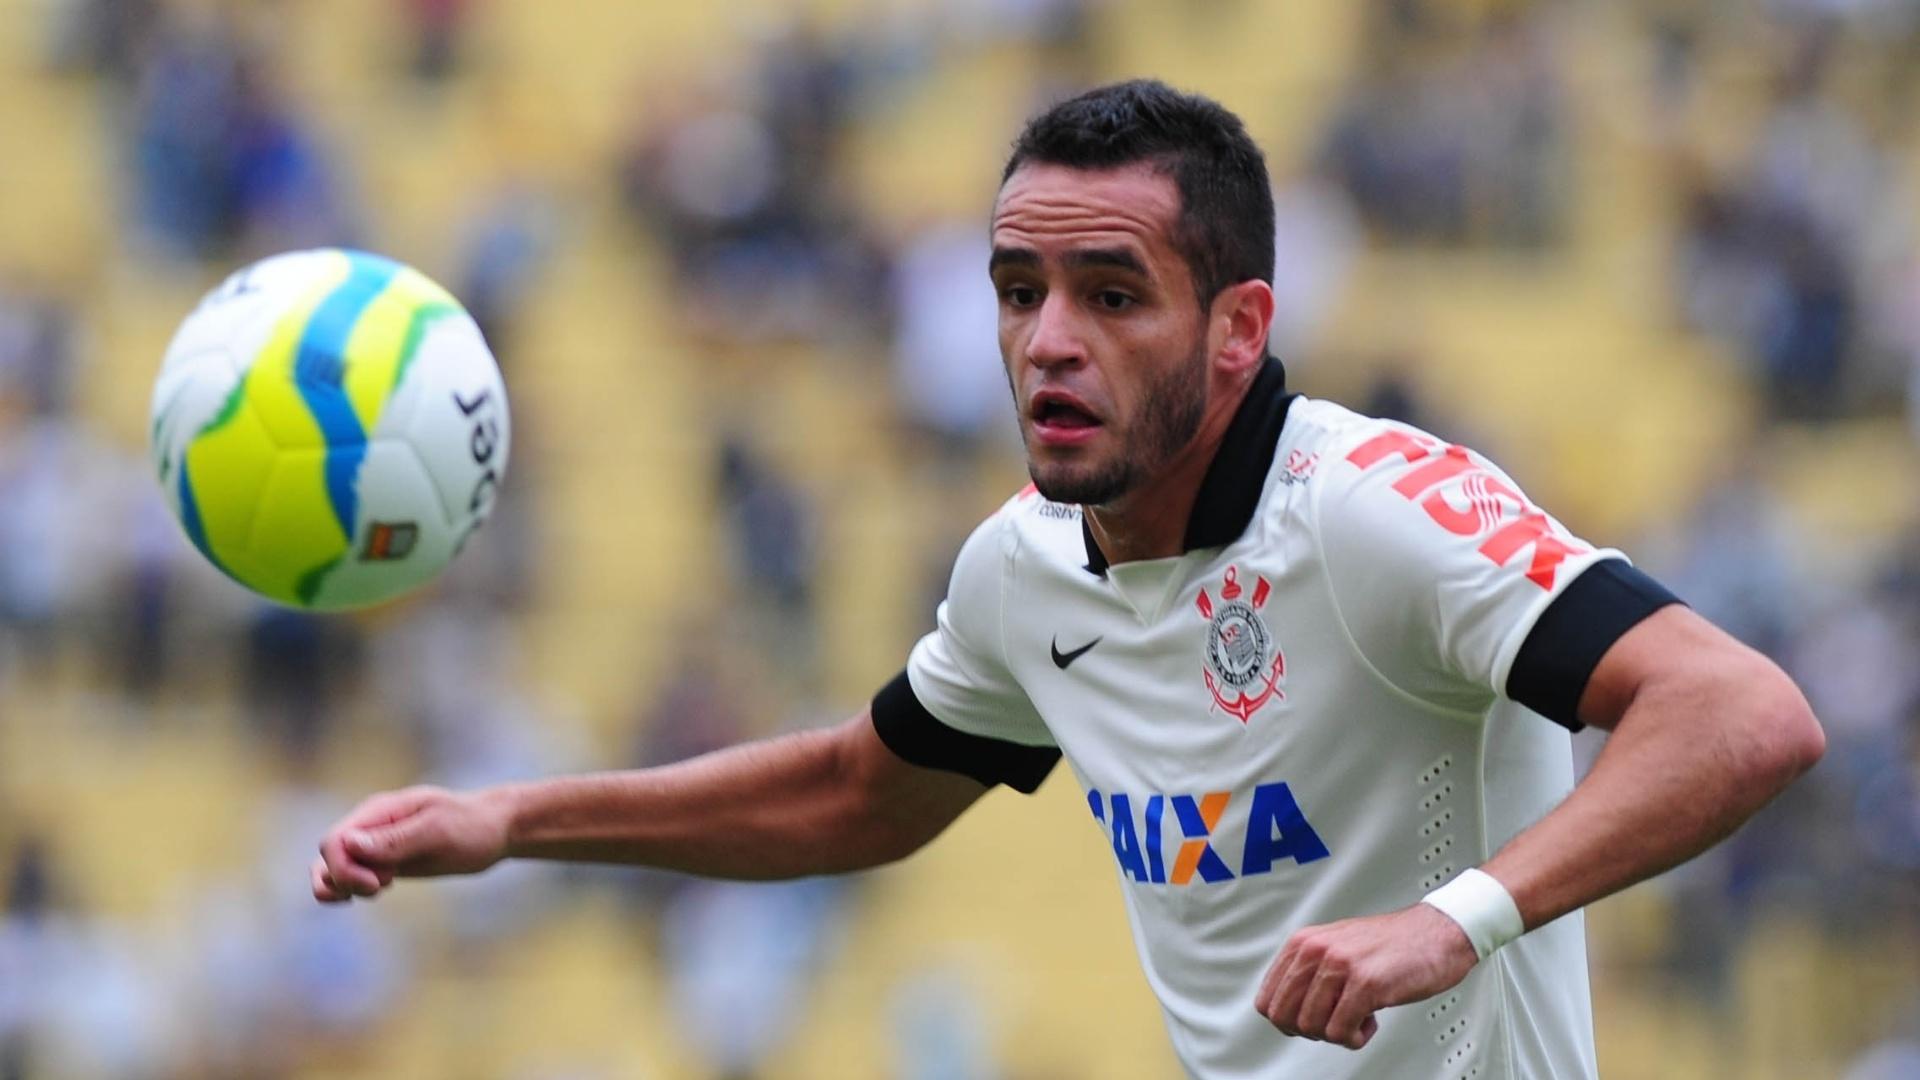 Meia corintiano Renato Augusto corre atrás da bola no duelo contra o Atlético Sorocaba no Pacaembu